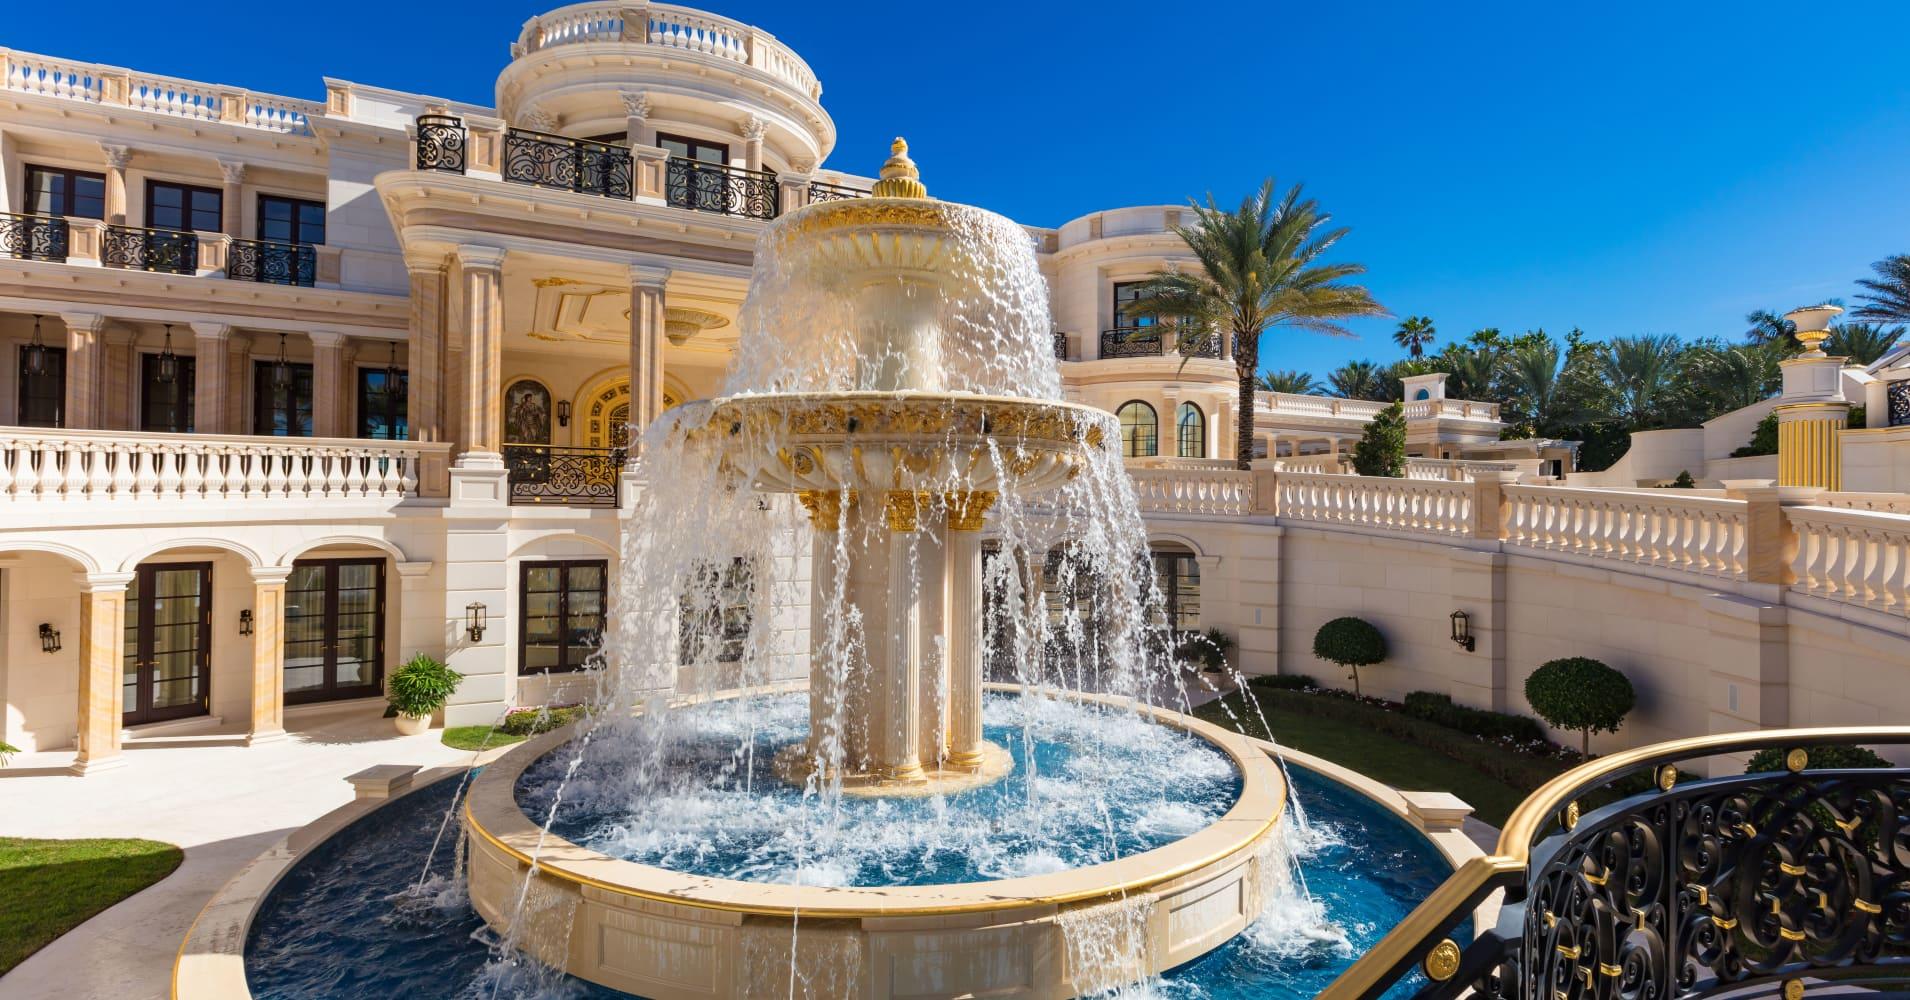 Photos: Inside Florida mega-mansion inspired by Versailles